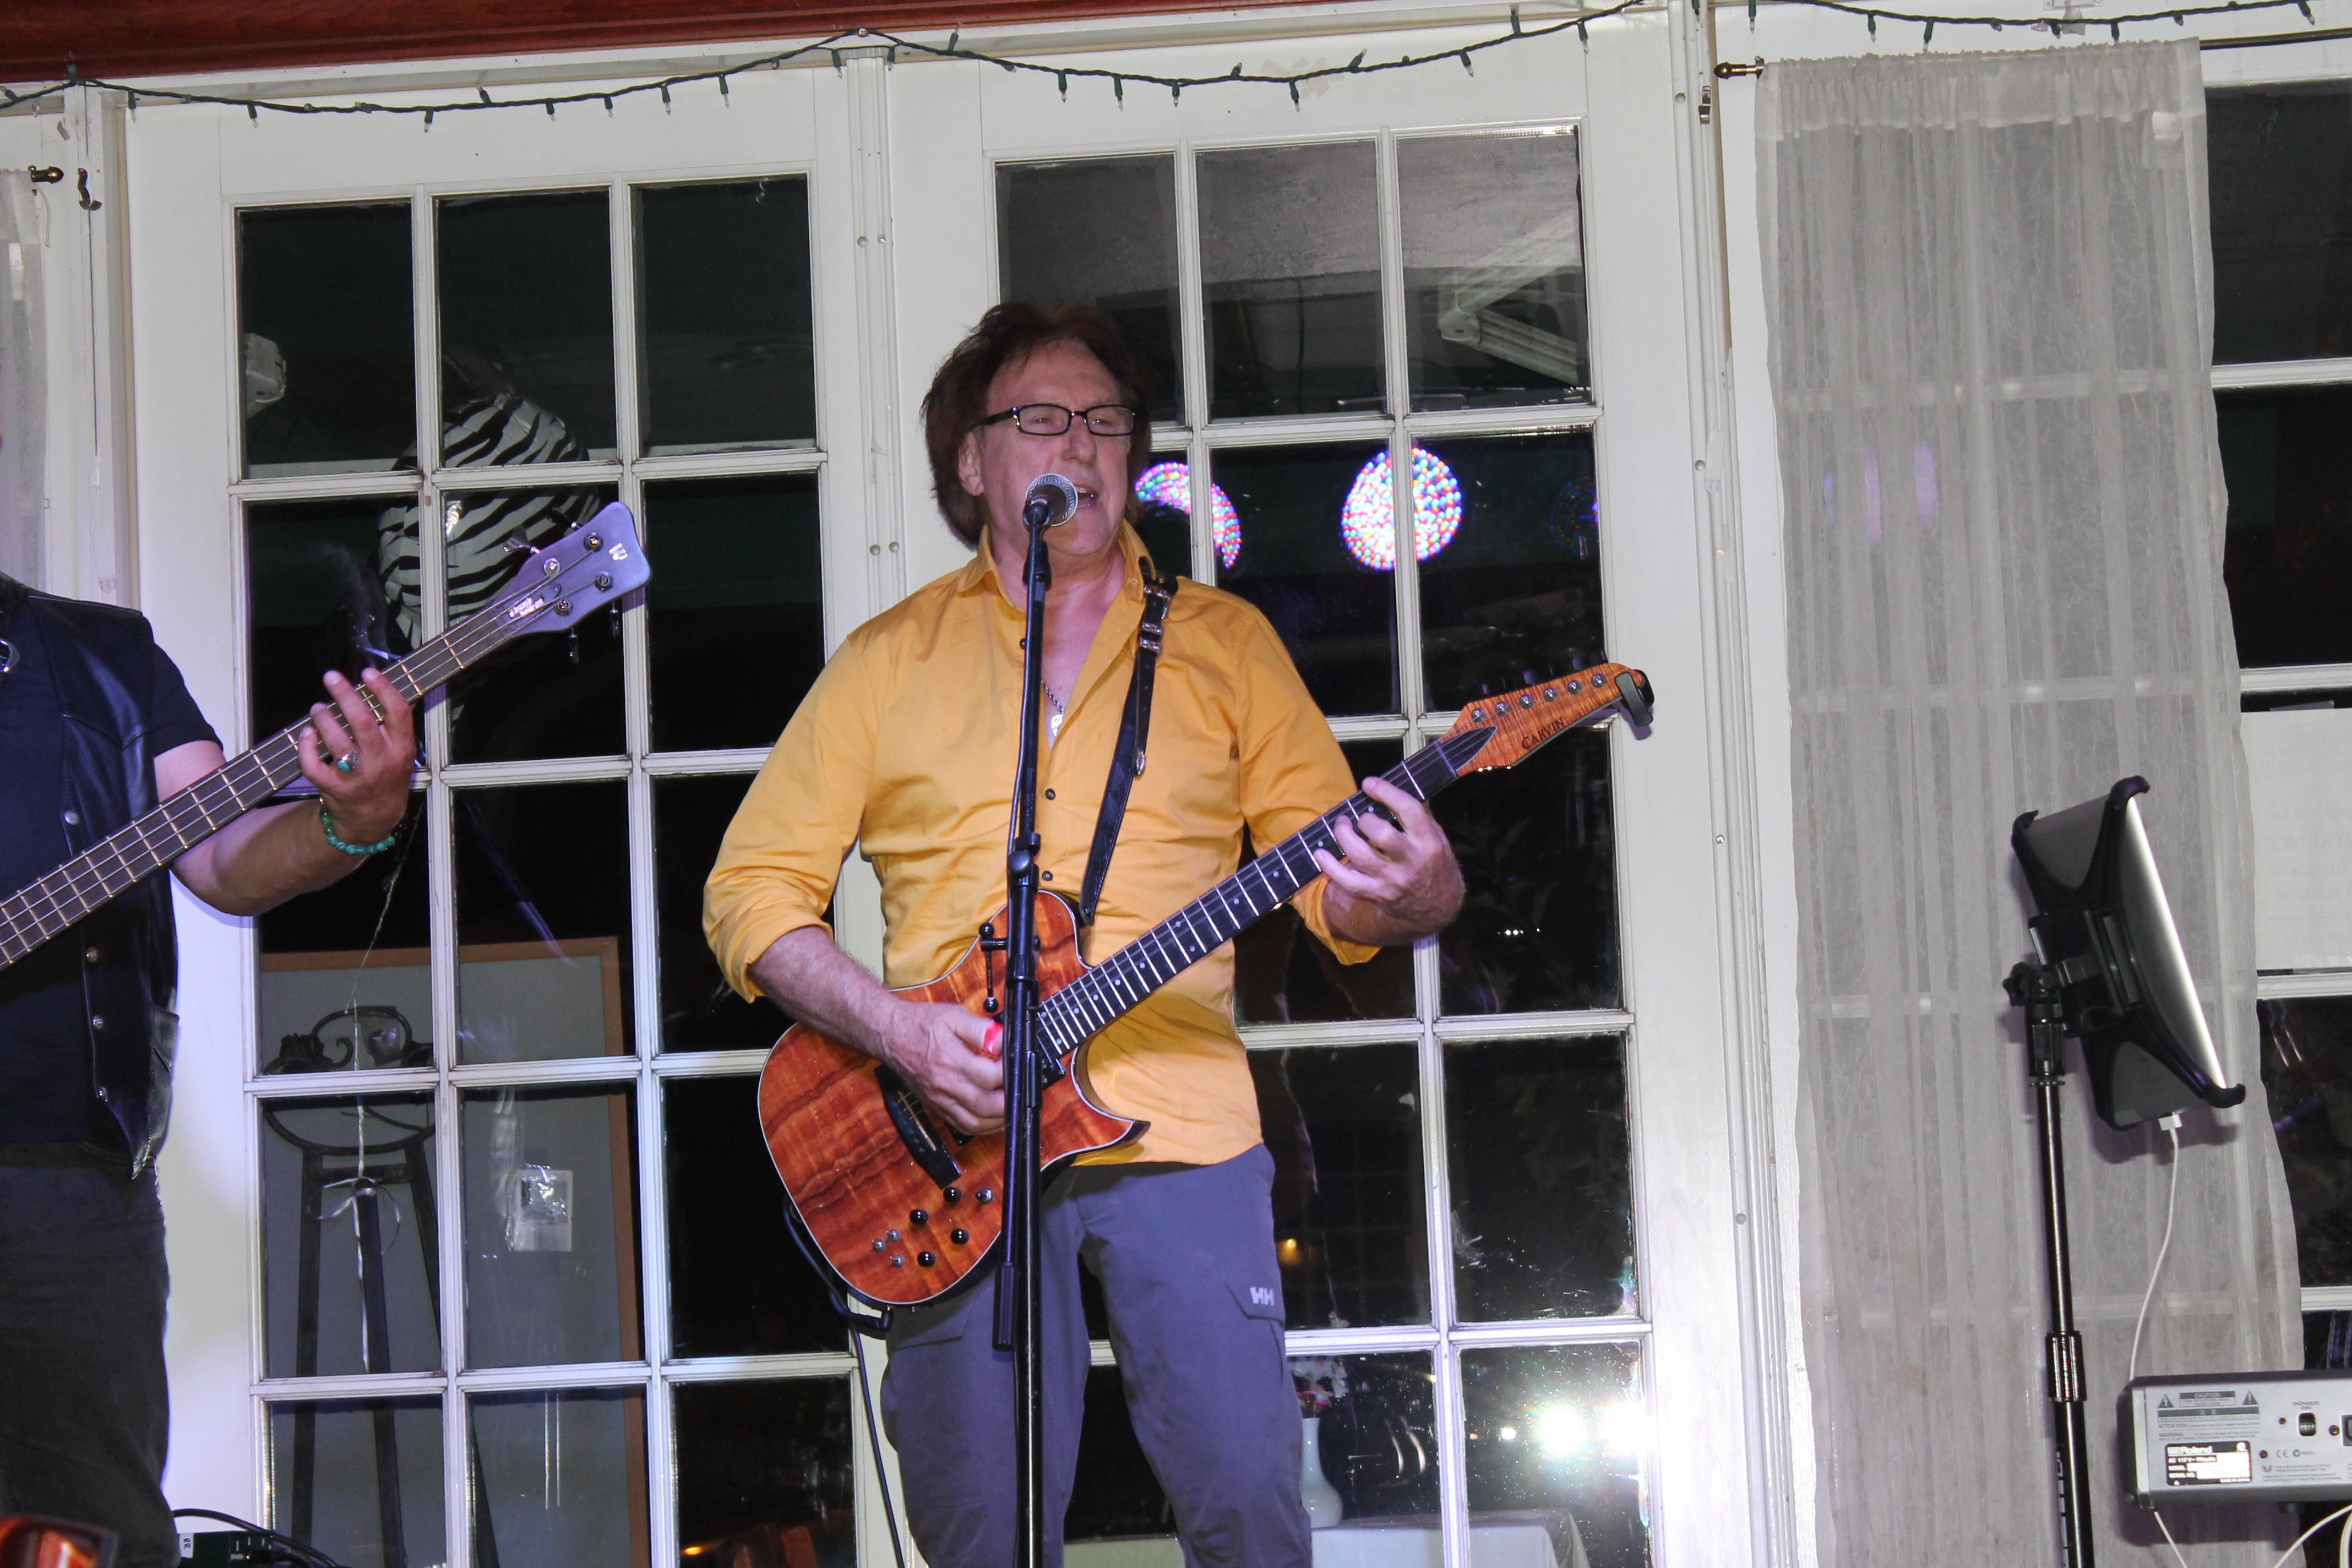 Caption: Denny Laine in concert , Credit: Richard Solomon